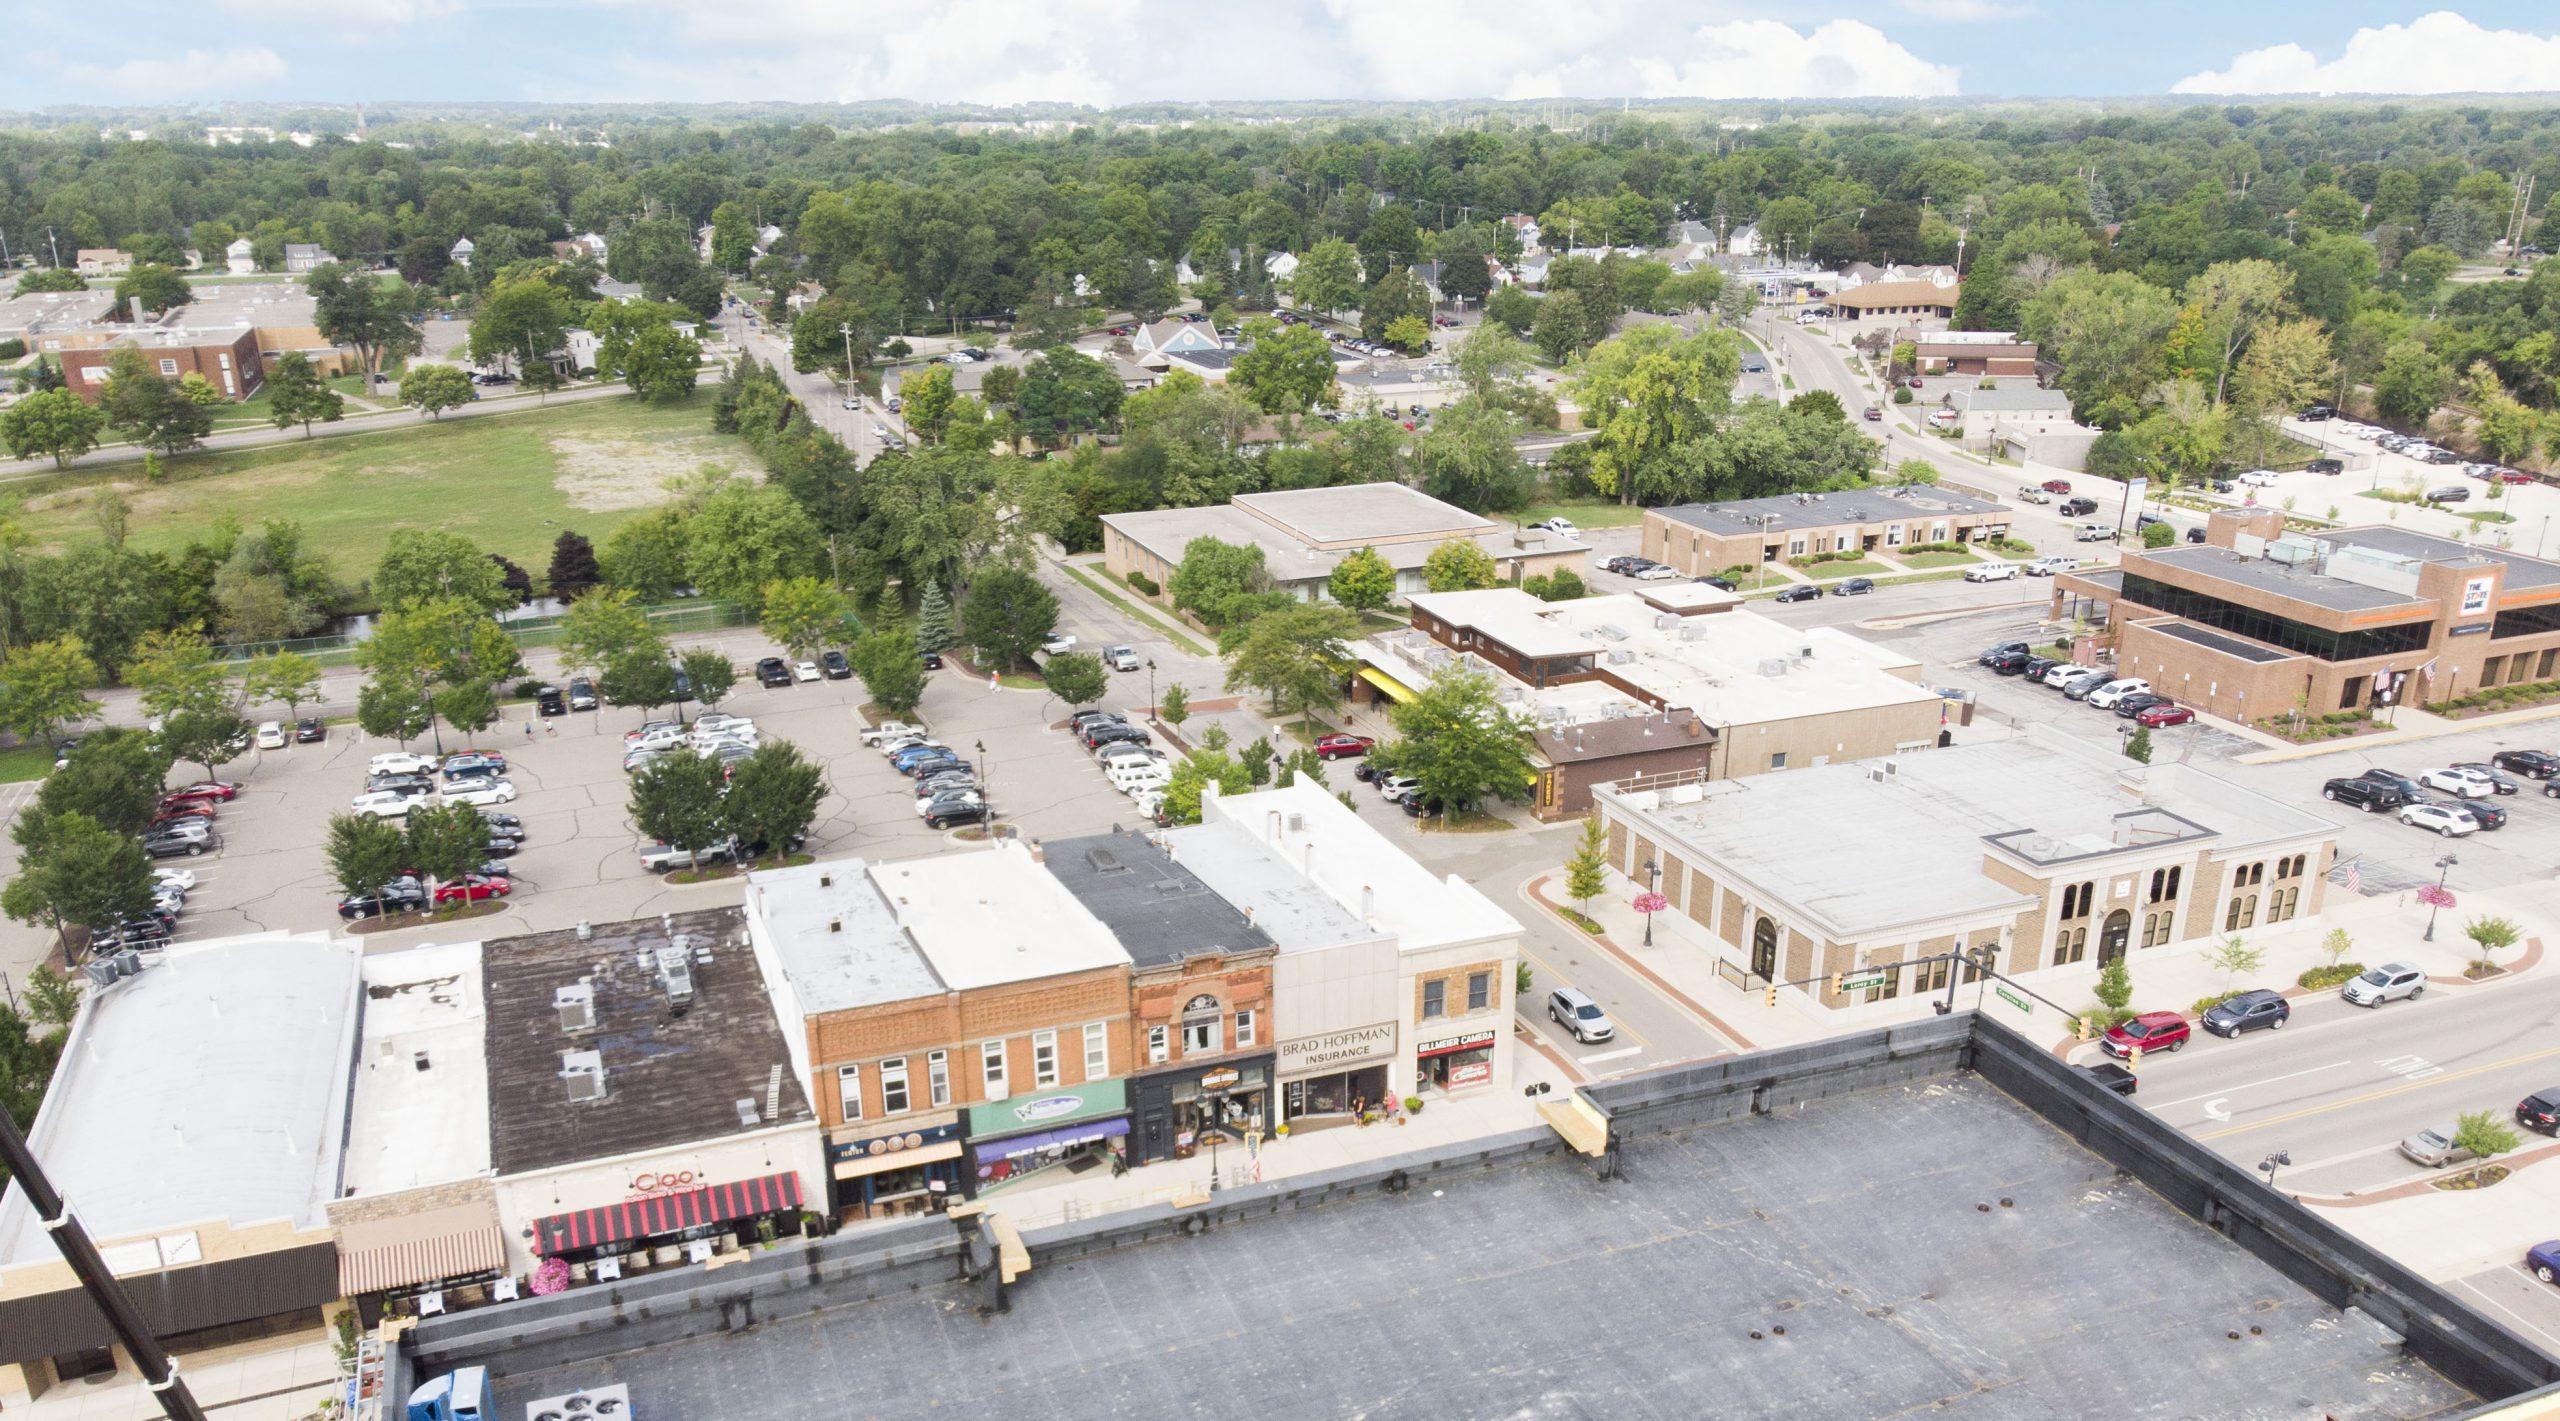 A Newcomer's Guide to Fenton, Michigan